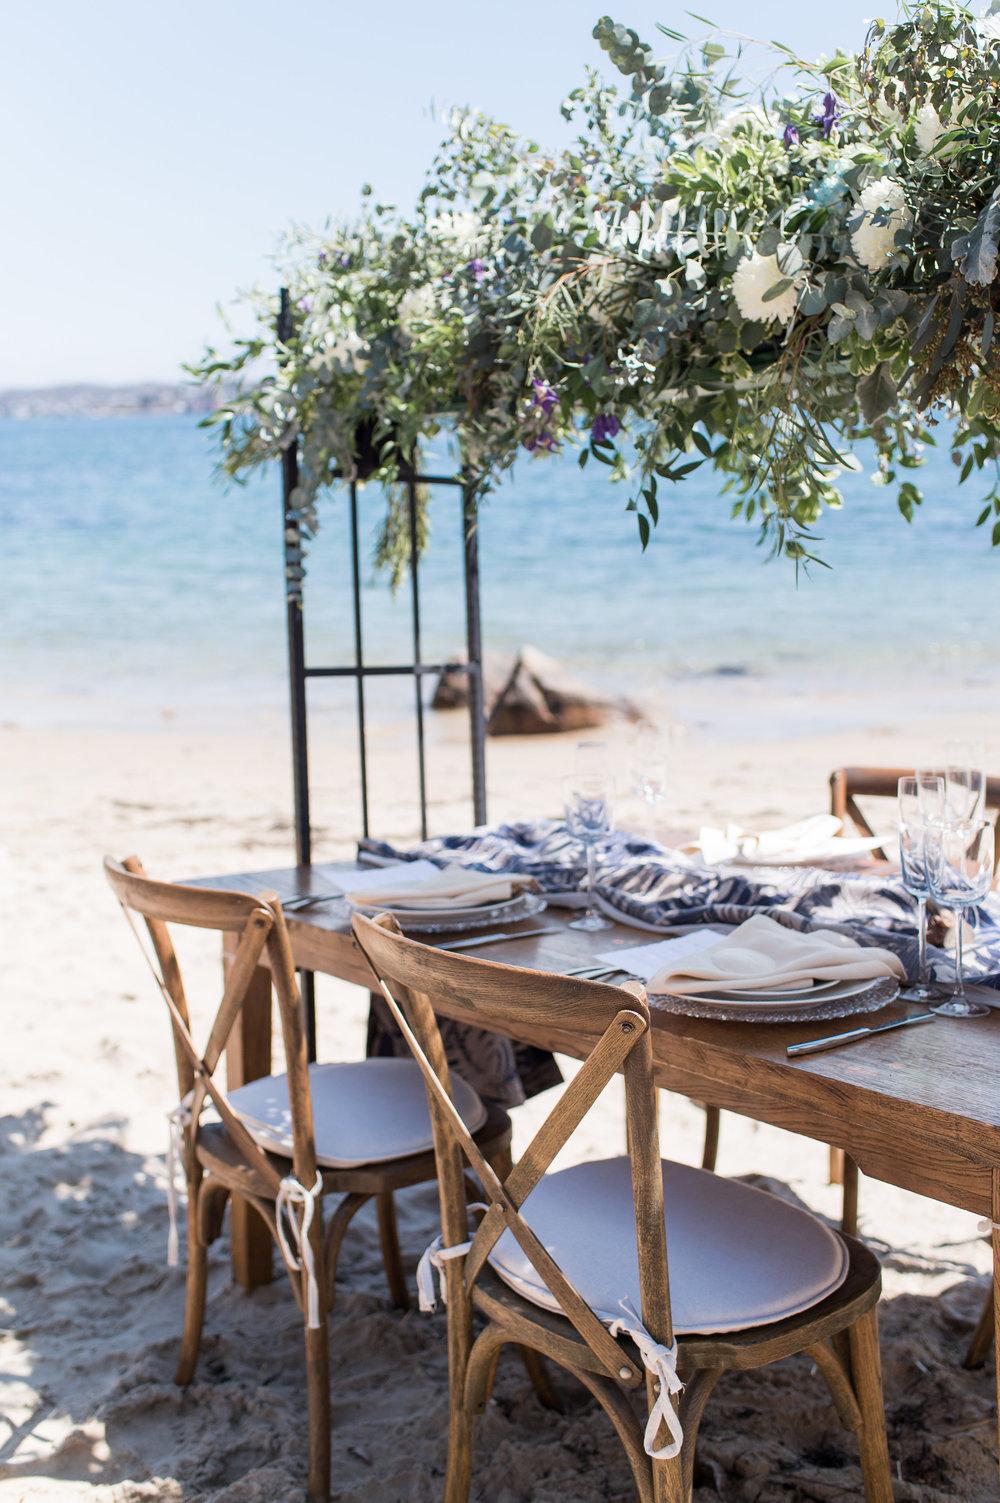 summer wedding beach wedding outdoors tablesetting